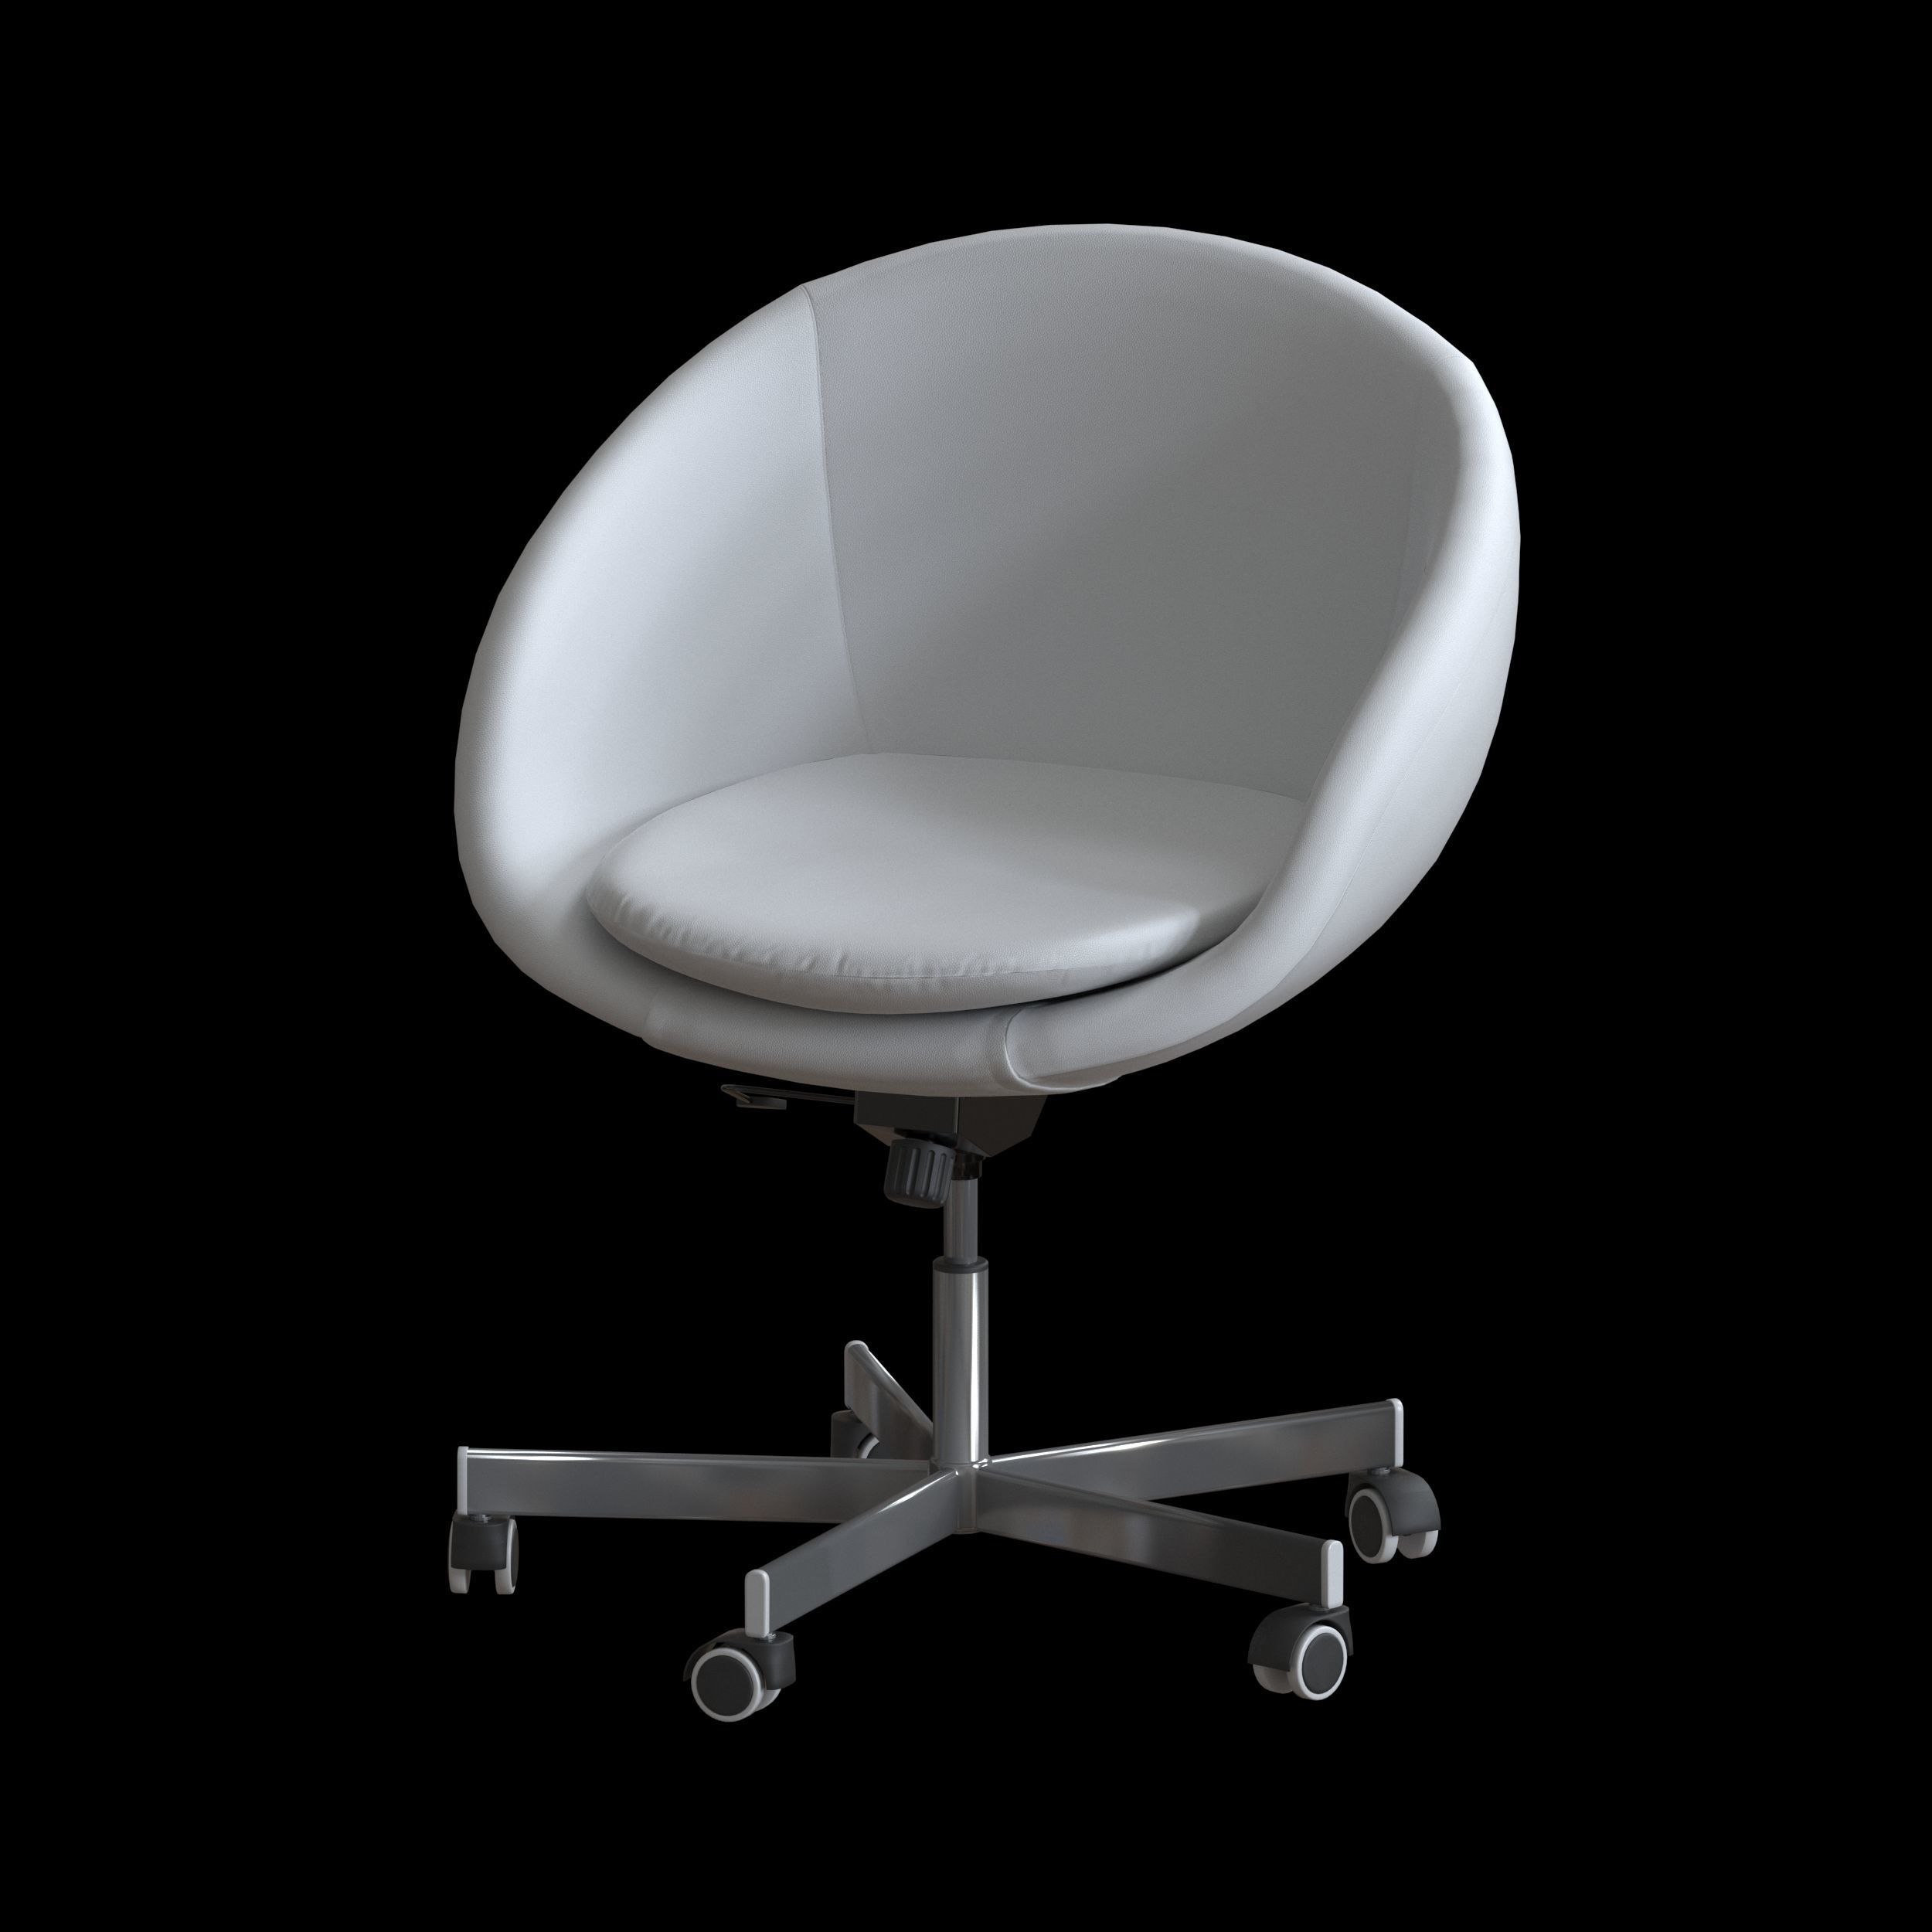 Fine Ikea Skruvsta Swivel Chair 3D Model Bralicious Painted Fabric Chair Ideas Braliciousco